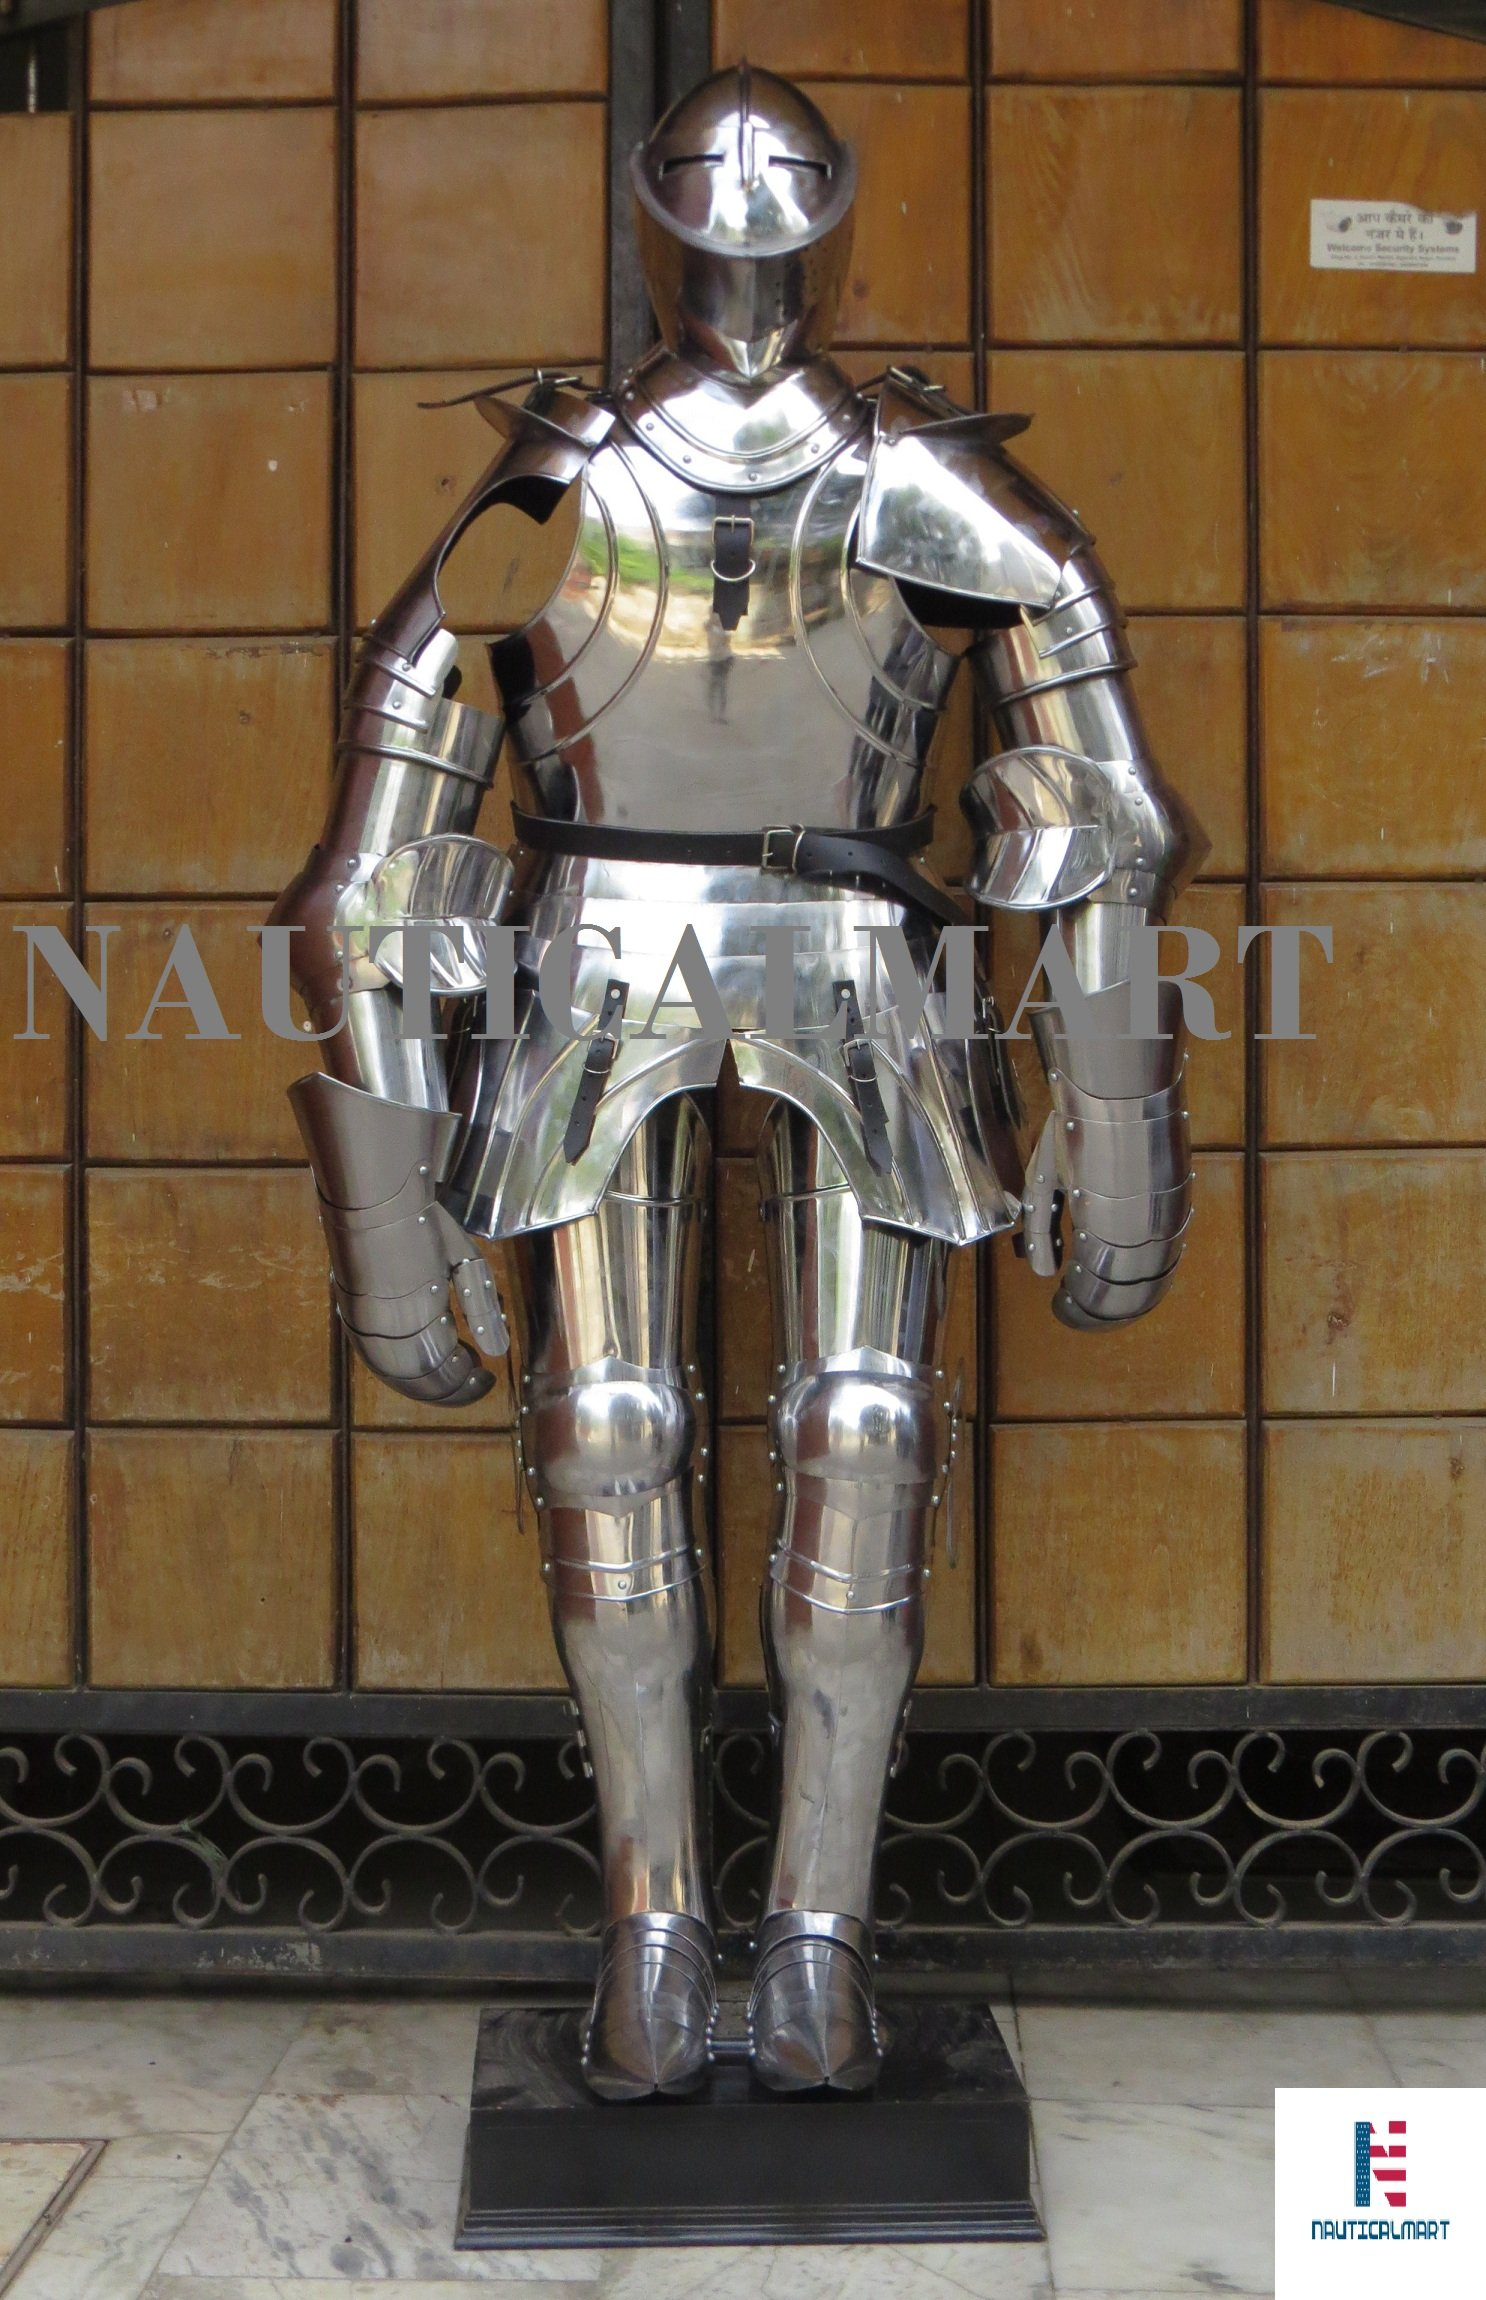 NauticalMart Medieval Gothic Knight Suit Of Armor 15th Century Combat Halloween Body Armour